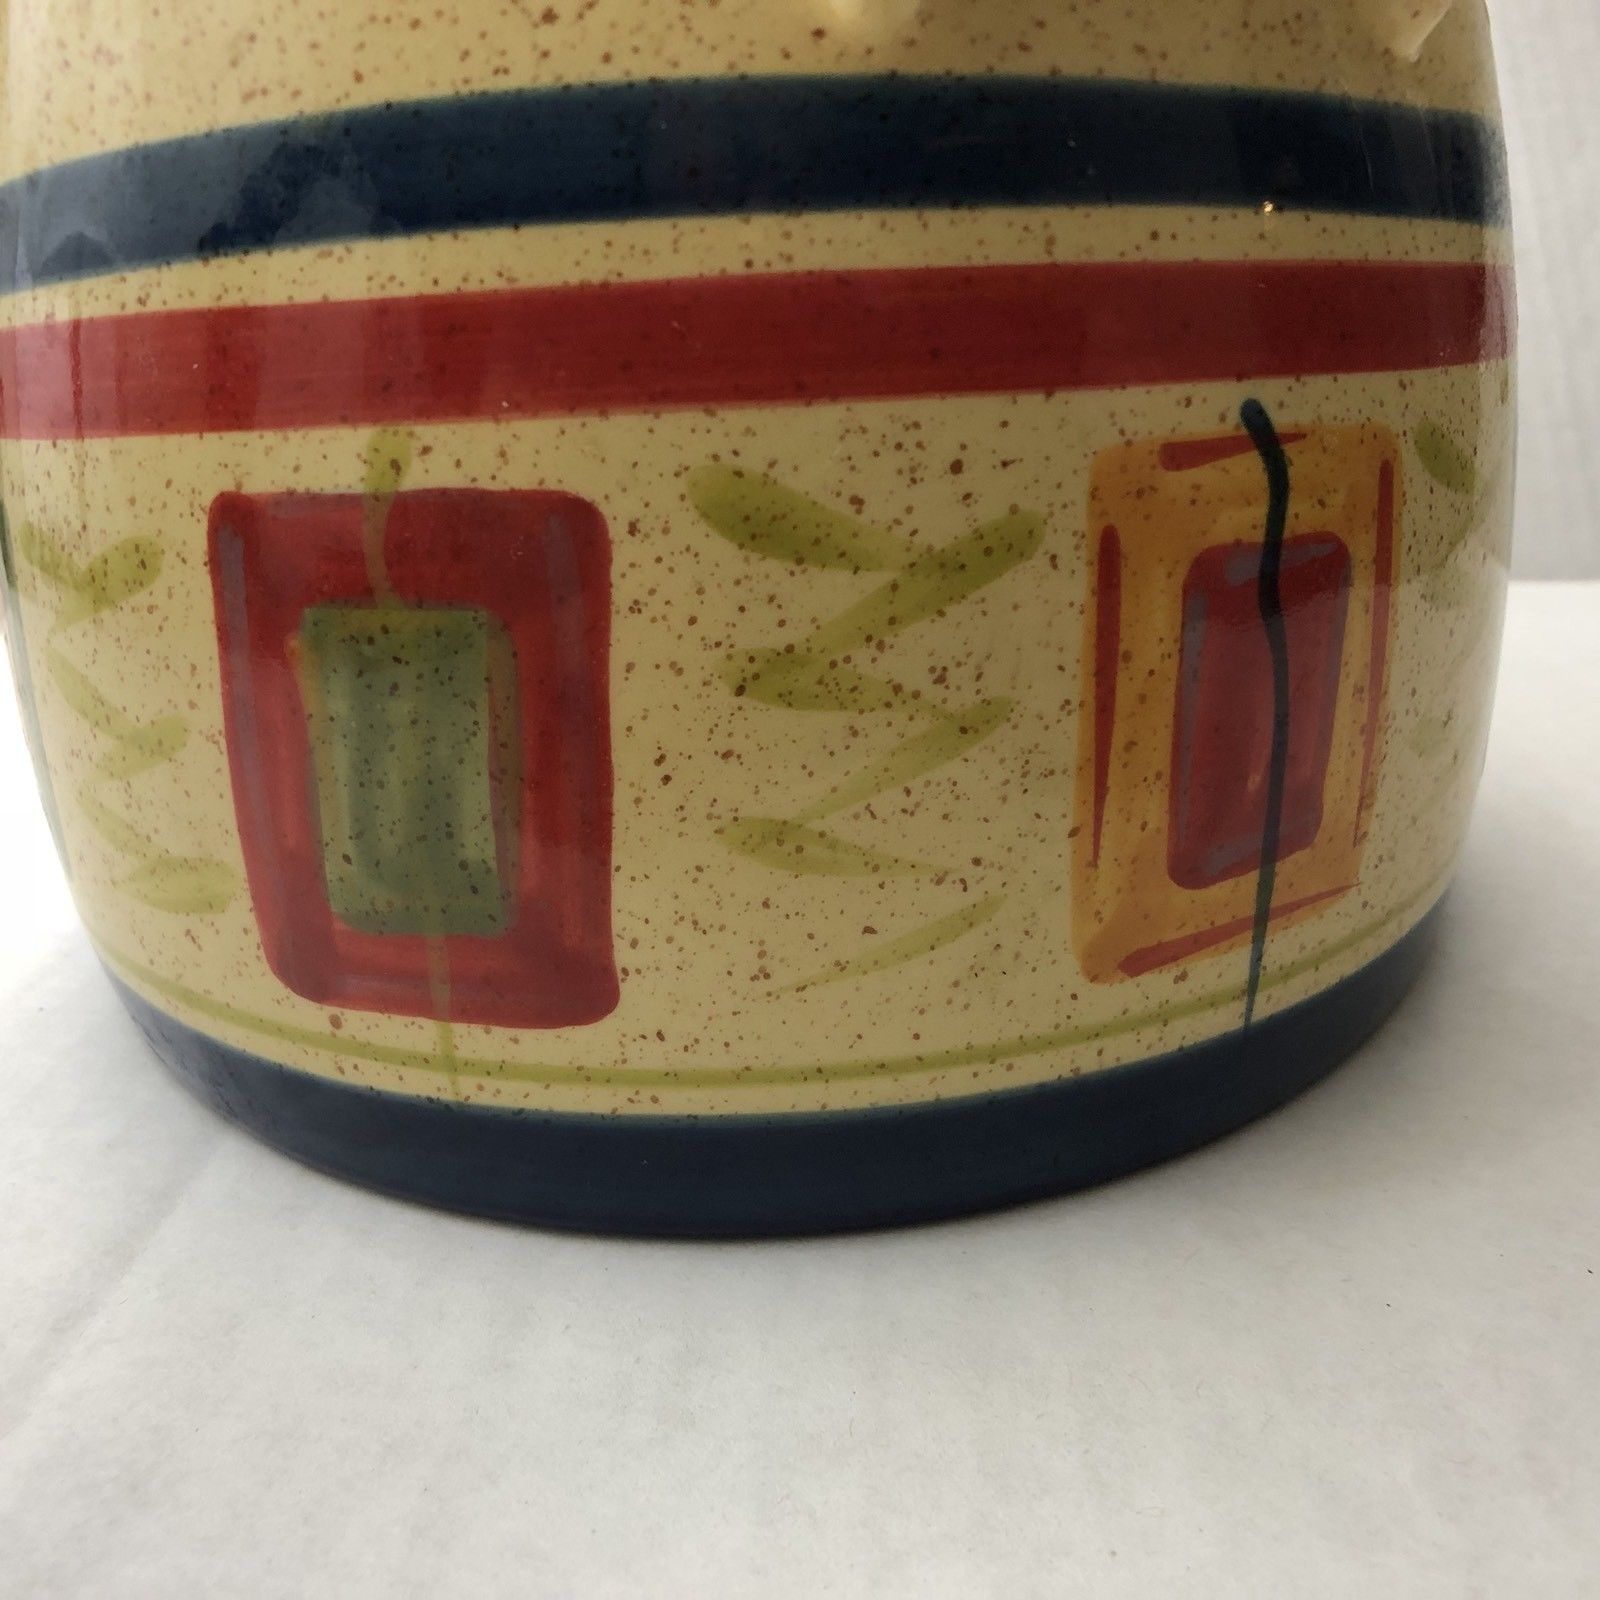 NEW Pfaltzgraff Sedona Hand Painted Small and 50 similar items